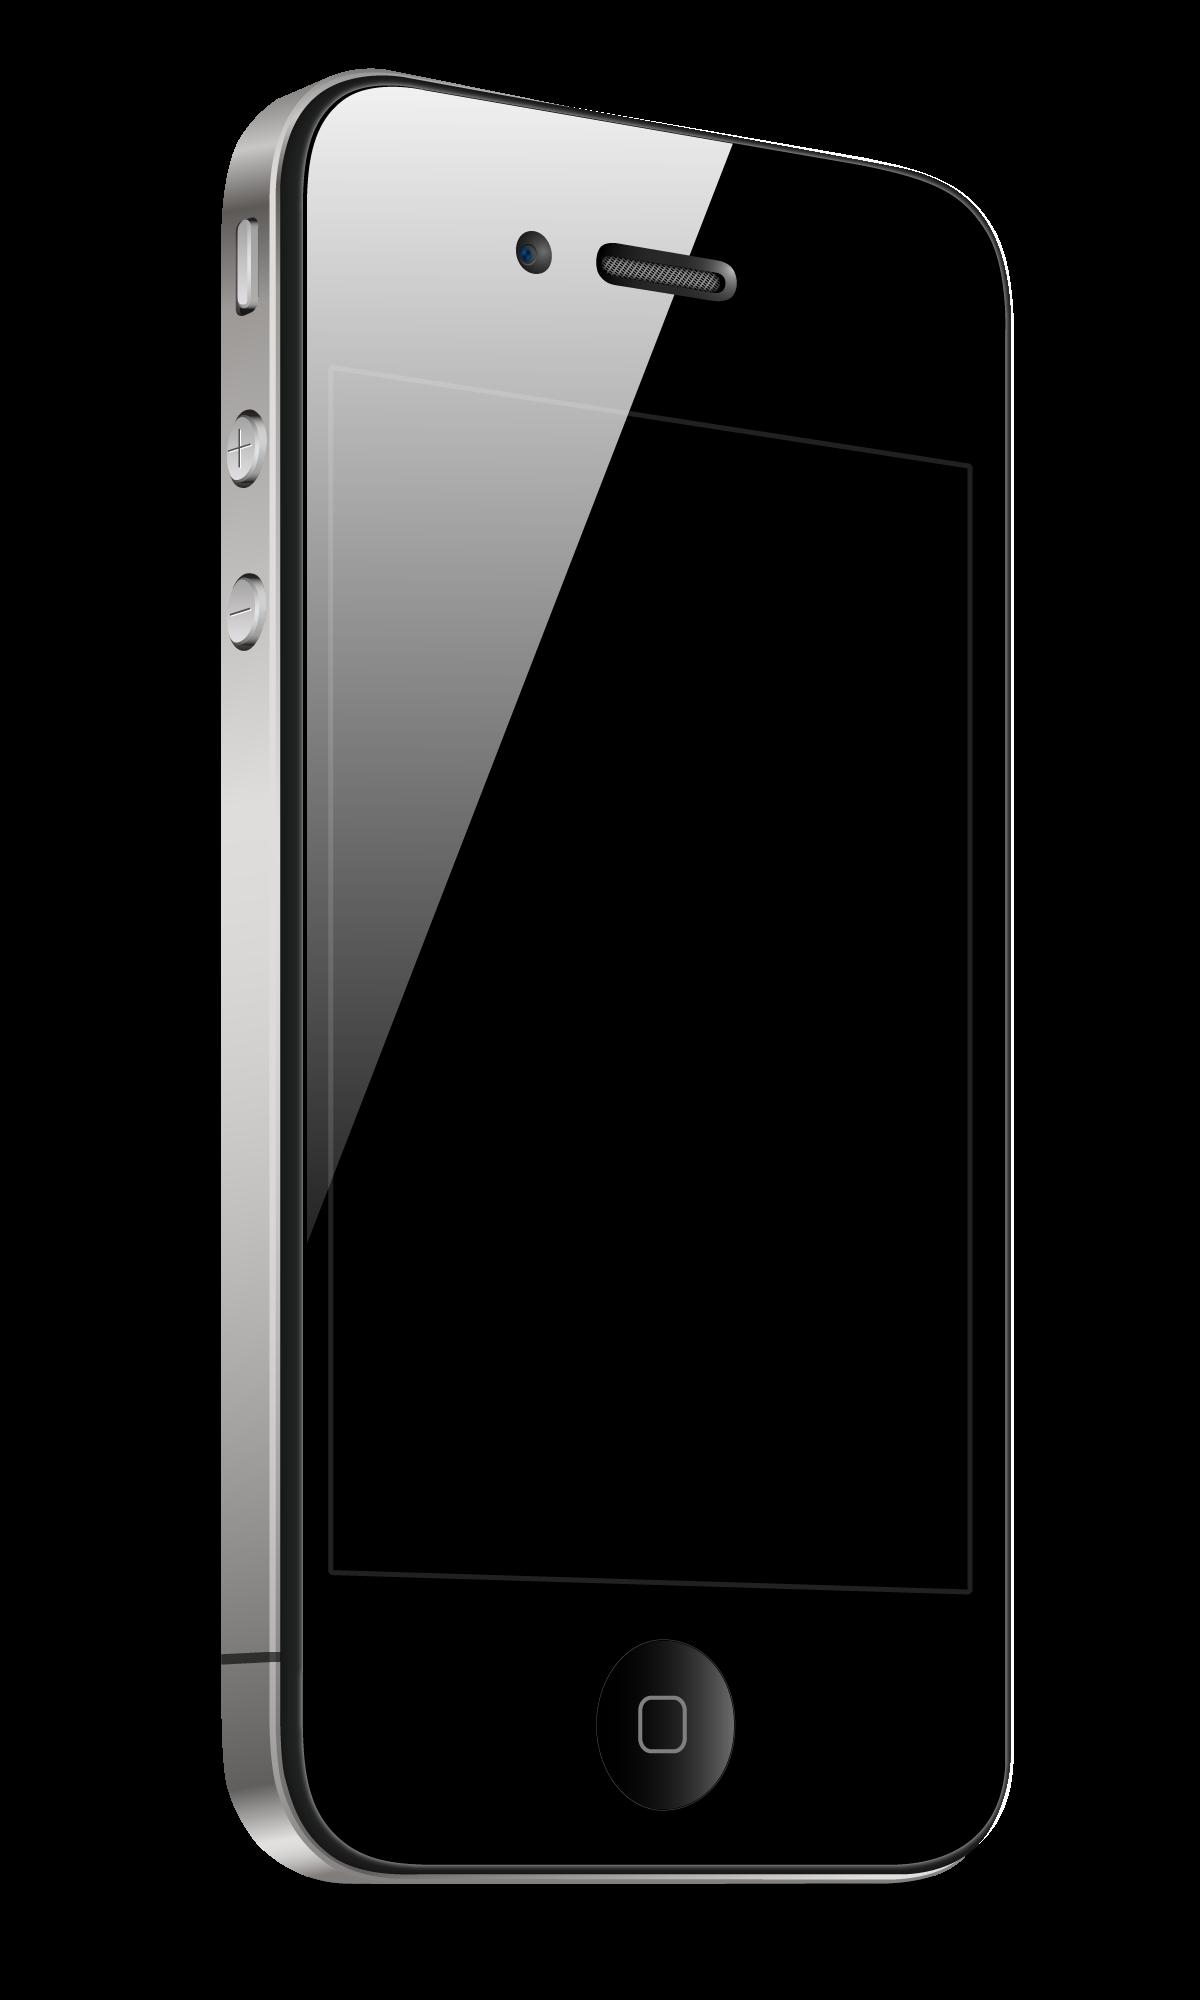 Compas Iphone Clipart - Clipart Suggest